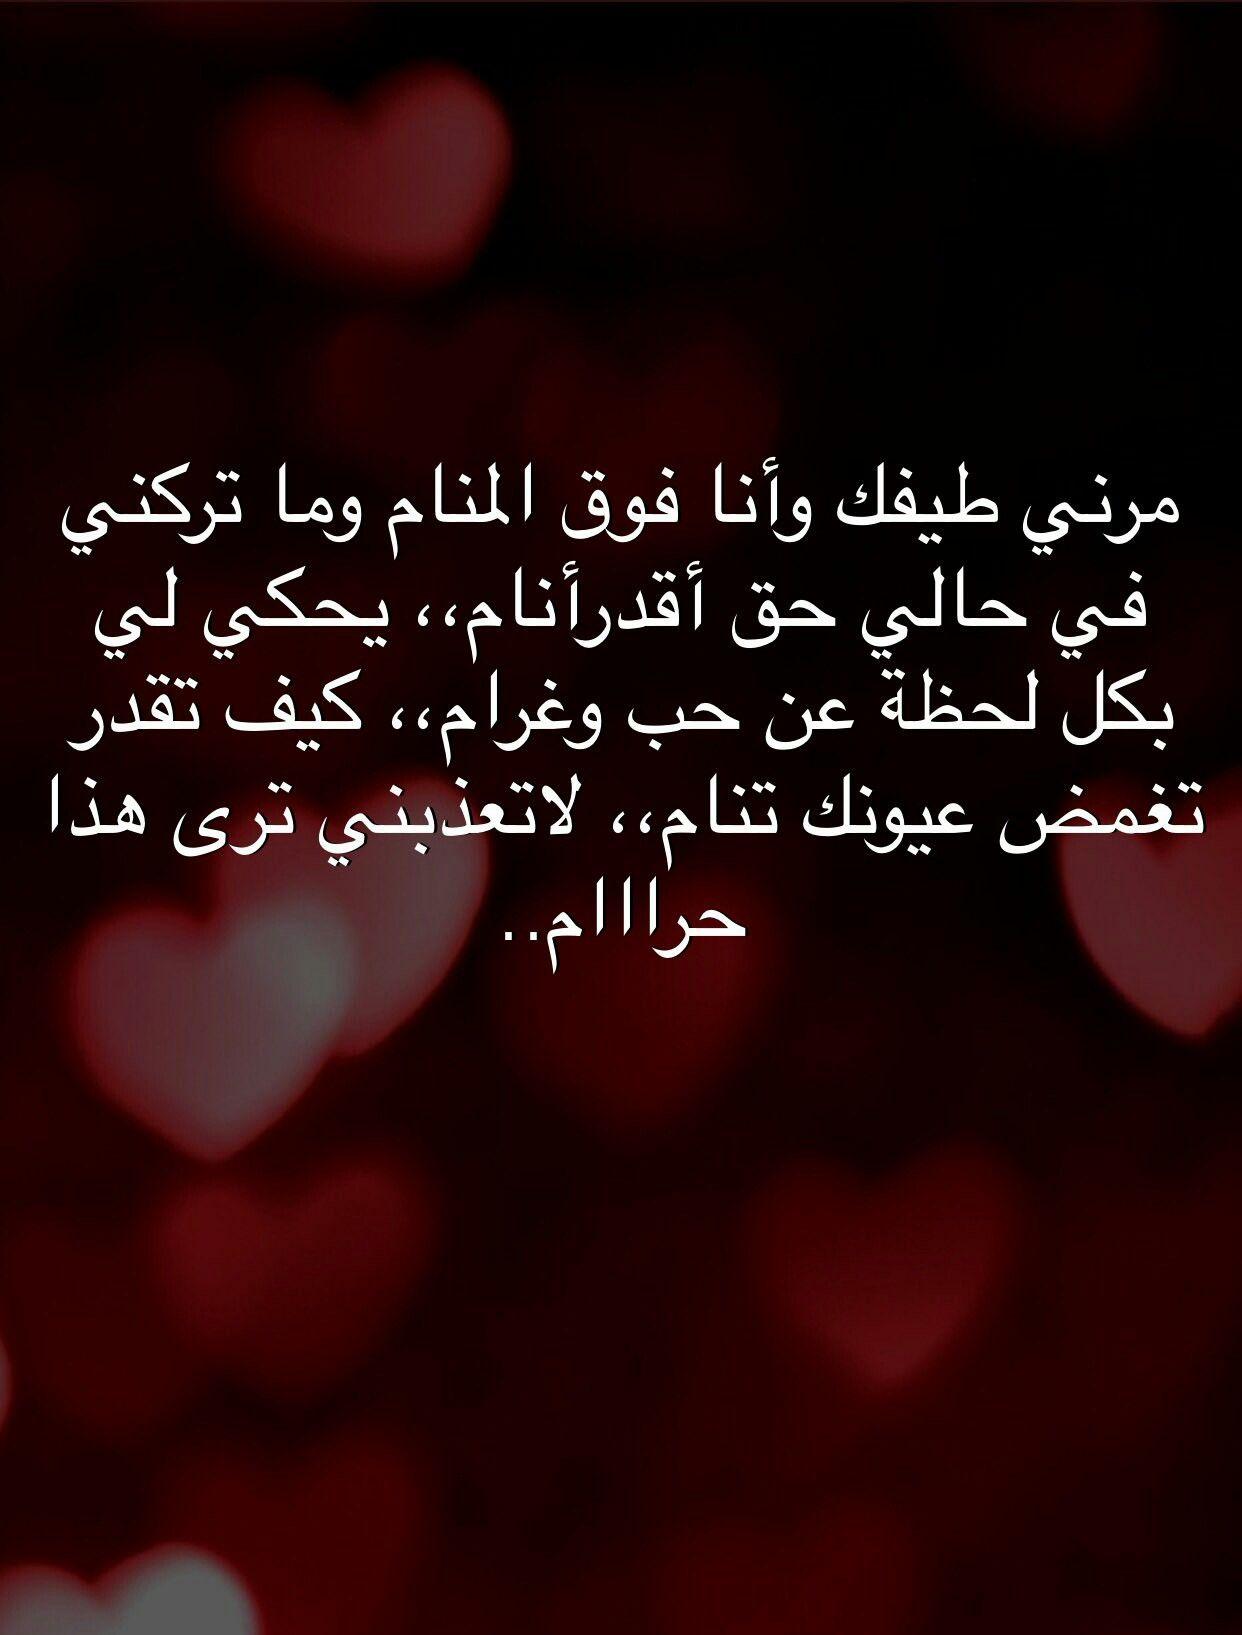 Pin By Saley On مناجاتي لك Quotes Lockscreen Screenshot Lockscreen